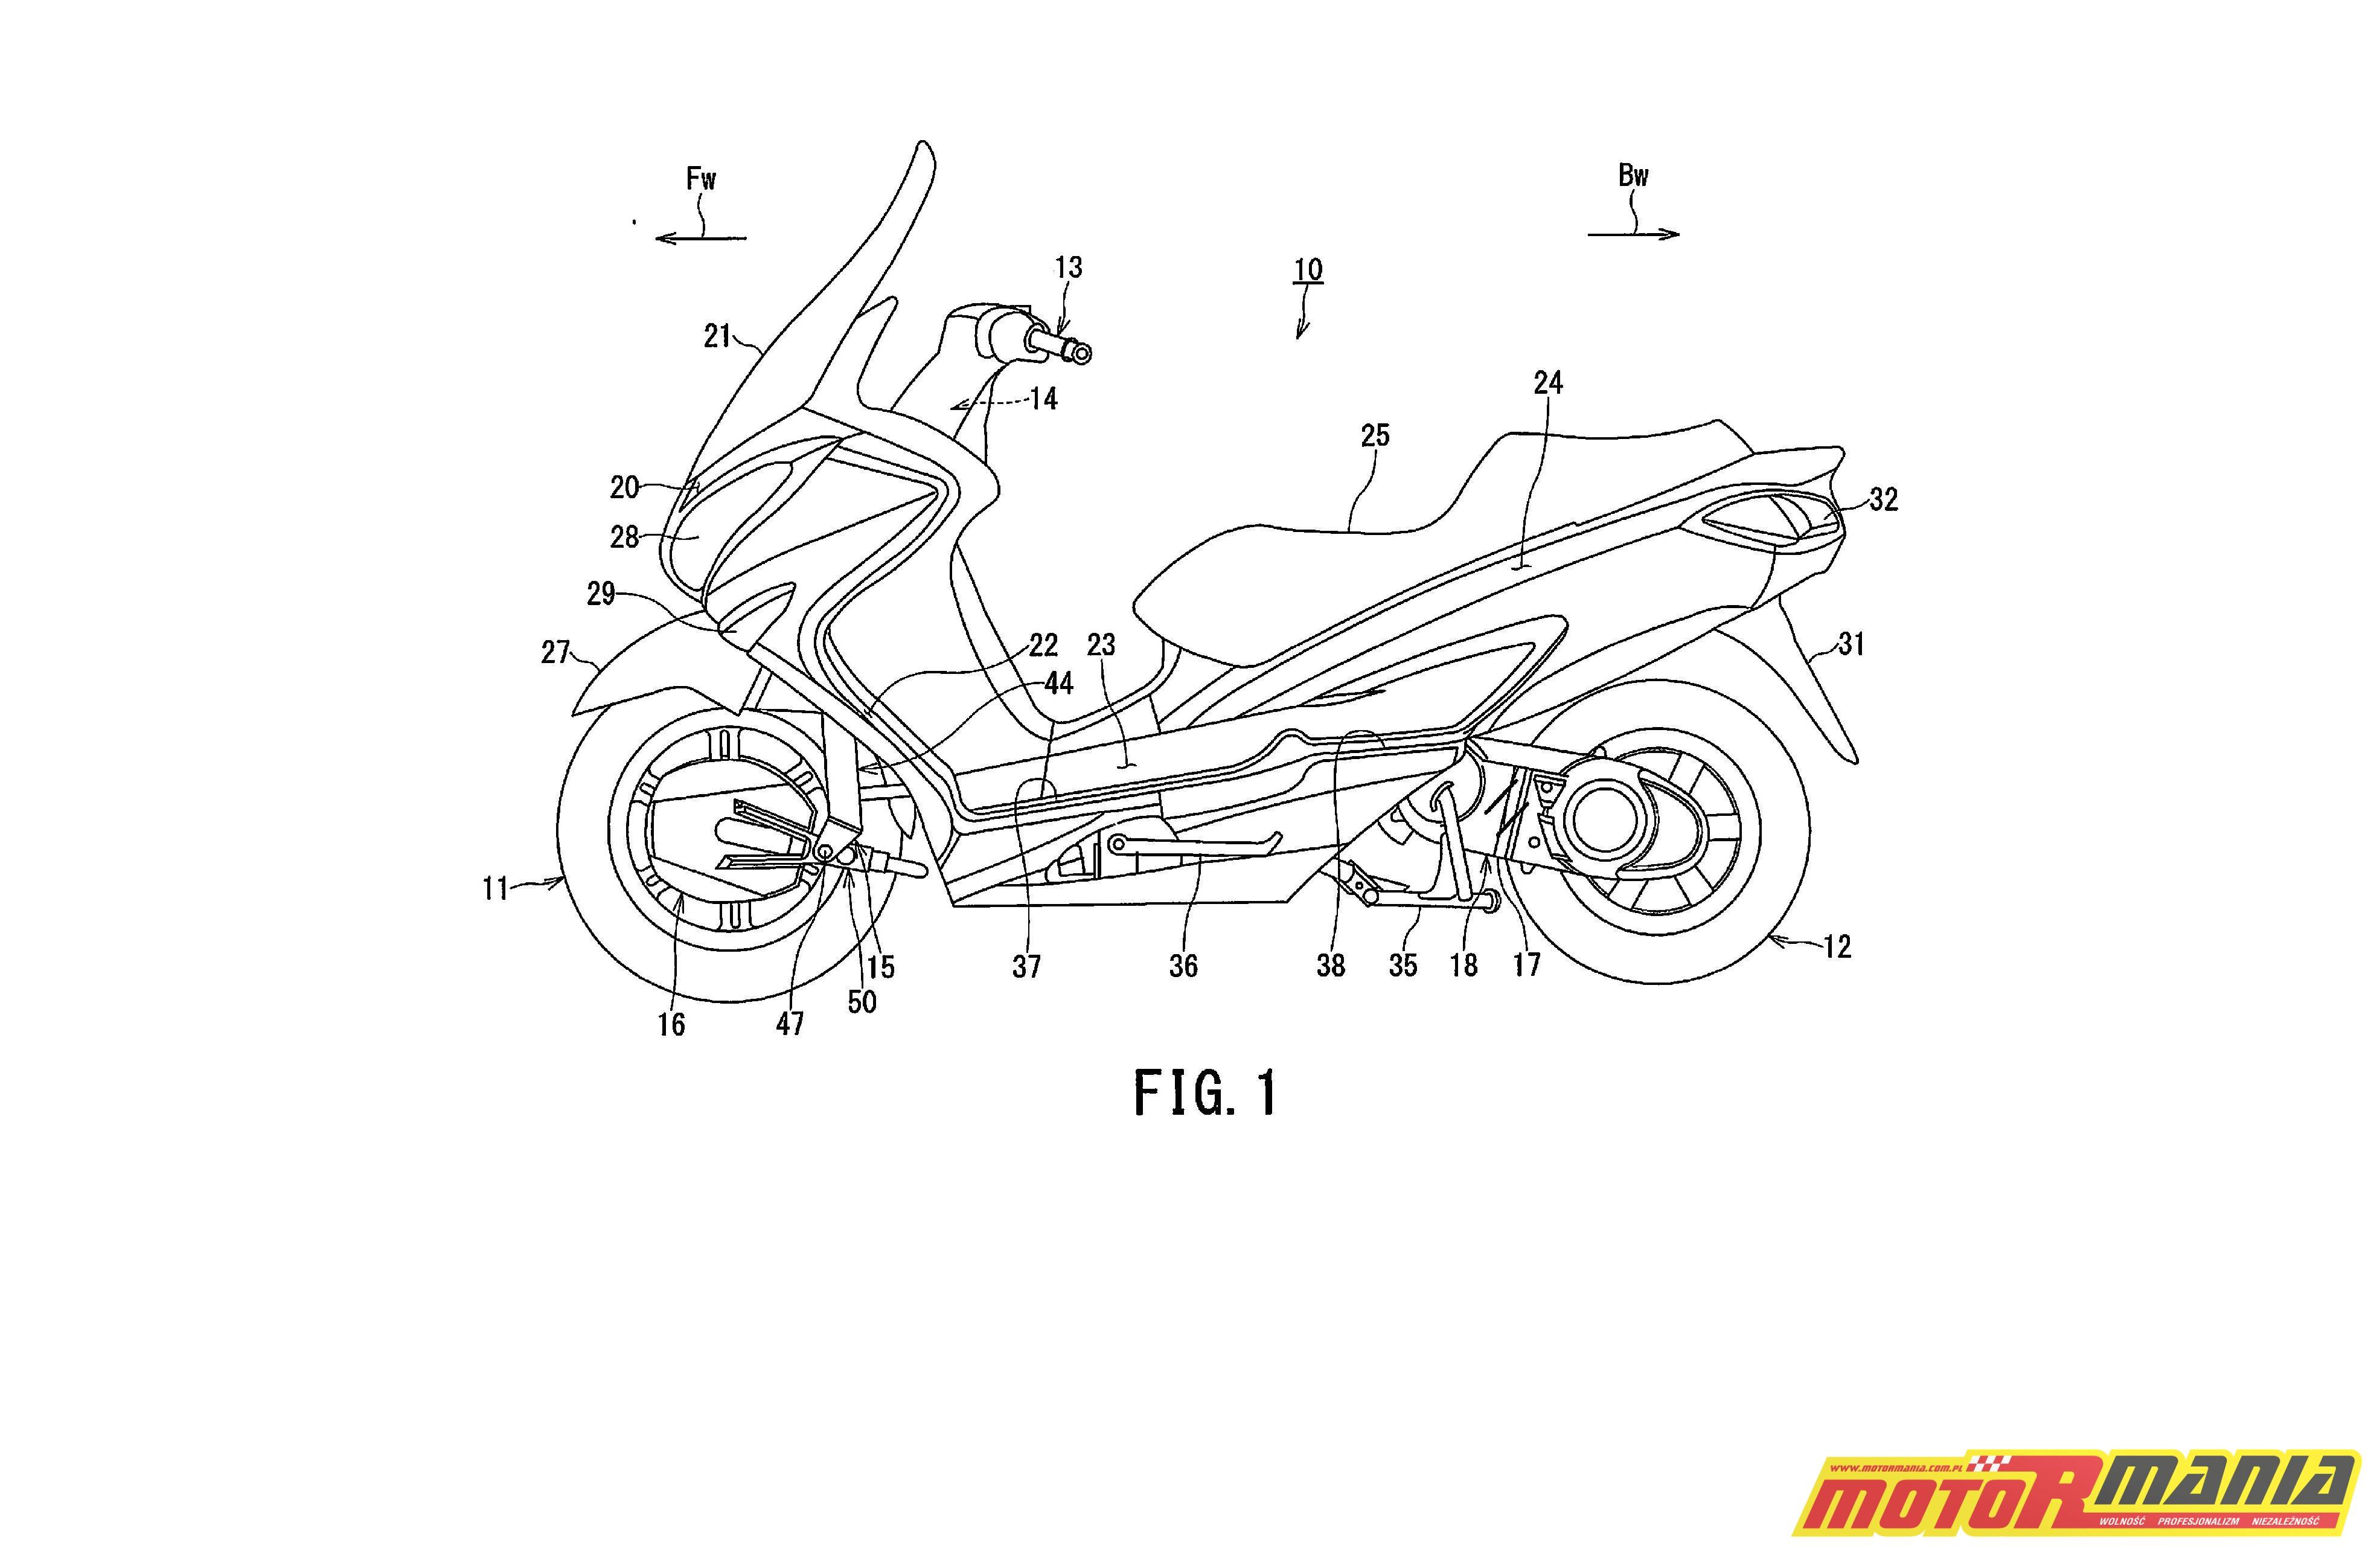 Suzuki Burgman 2WD hybryda elektryk - diagram (1)